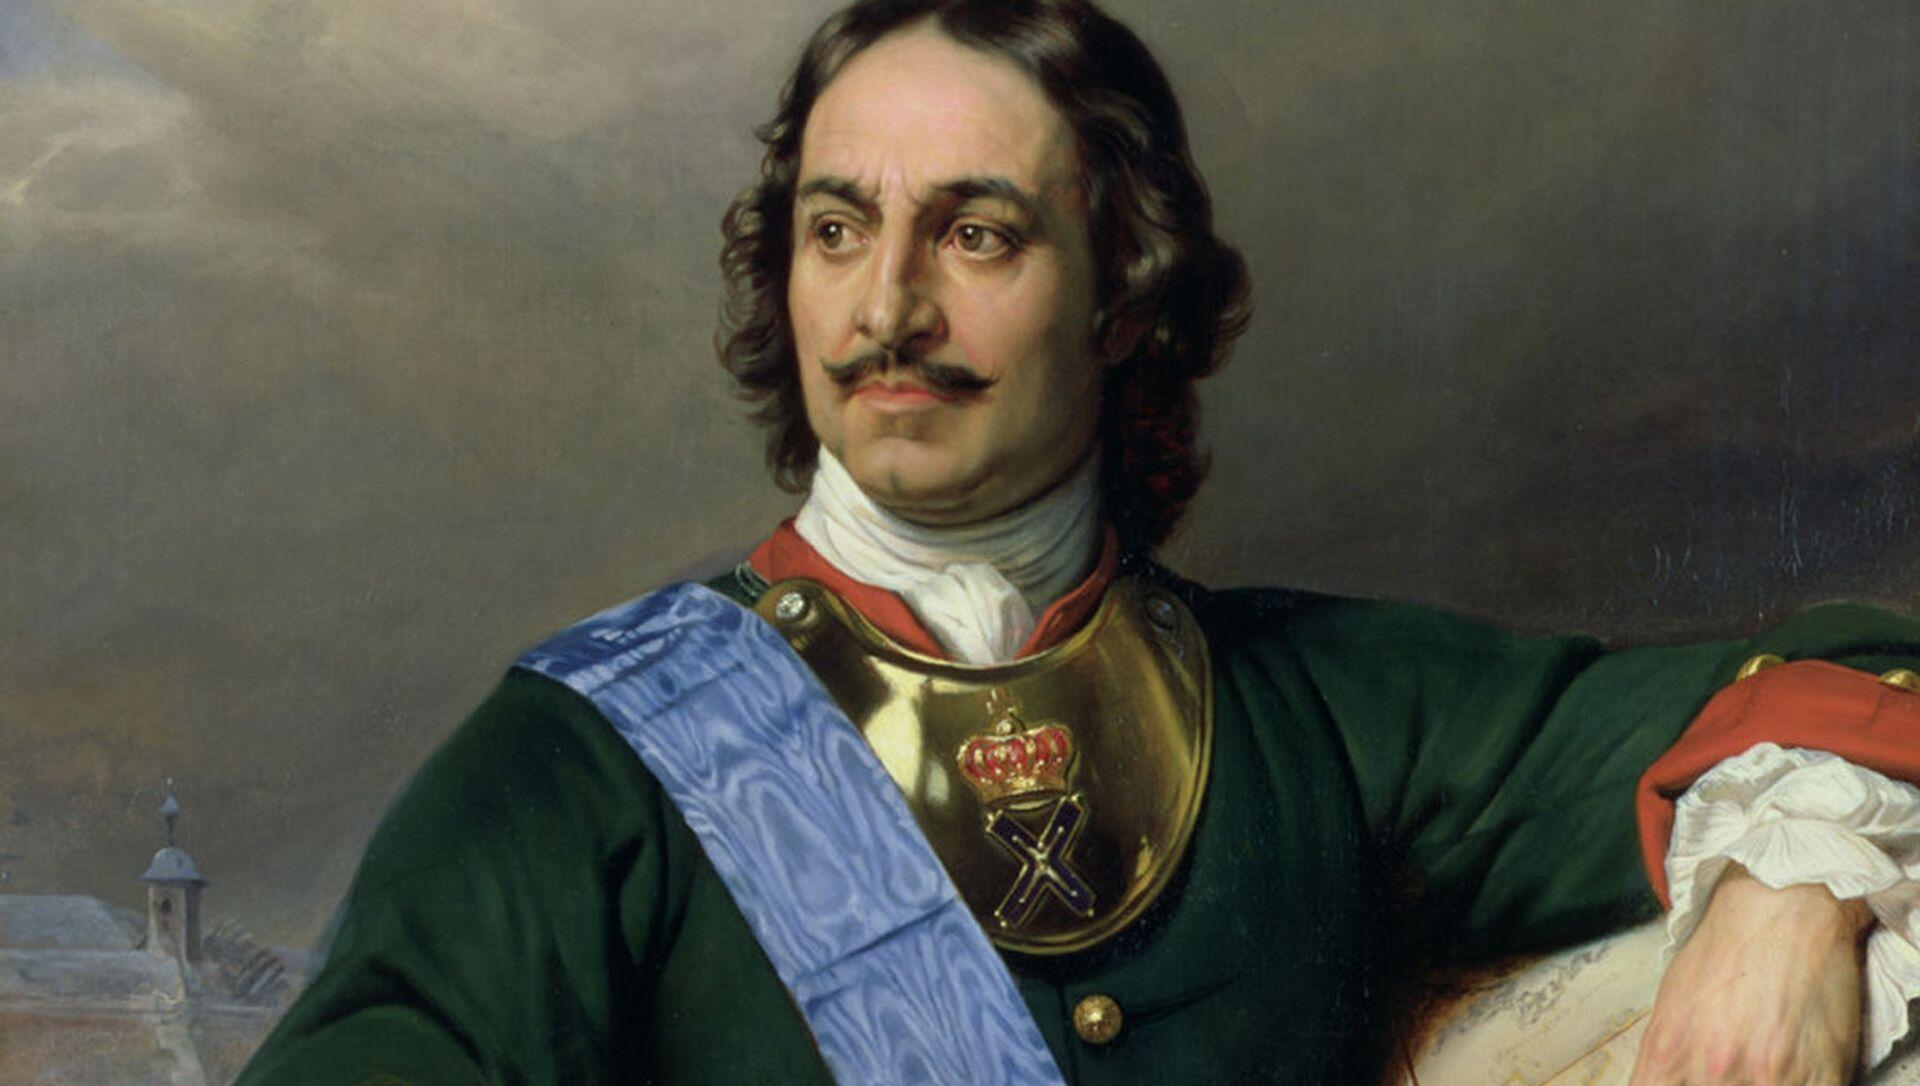 Руски цар Петар Велики  - Sputnik Србија, 1920, 07.03.2021